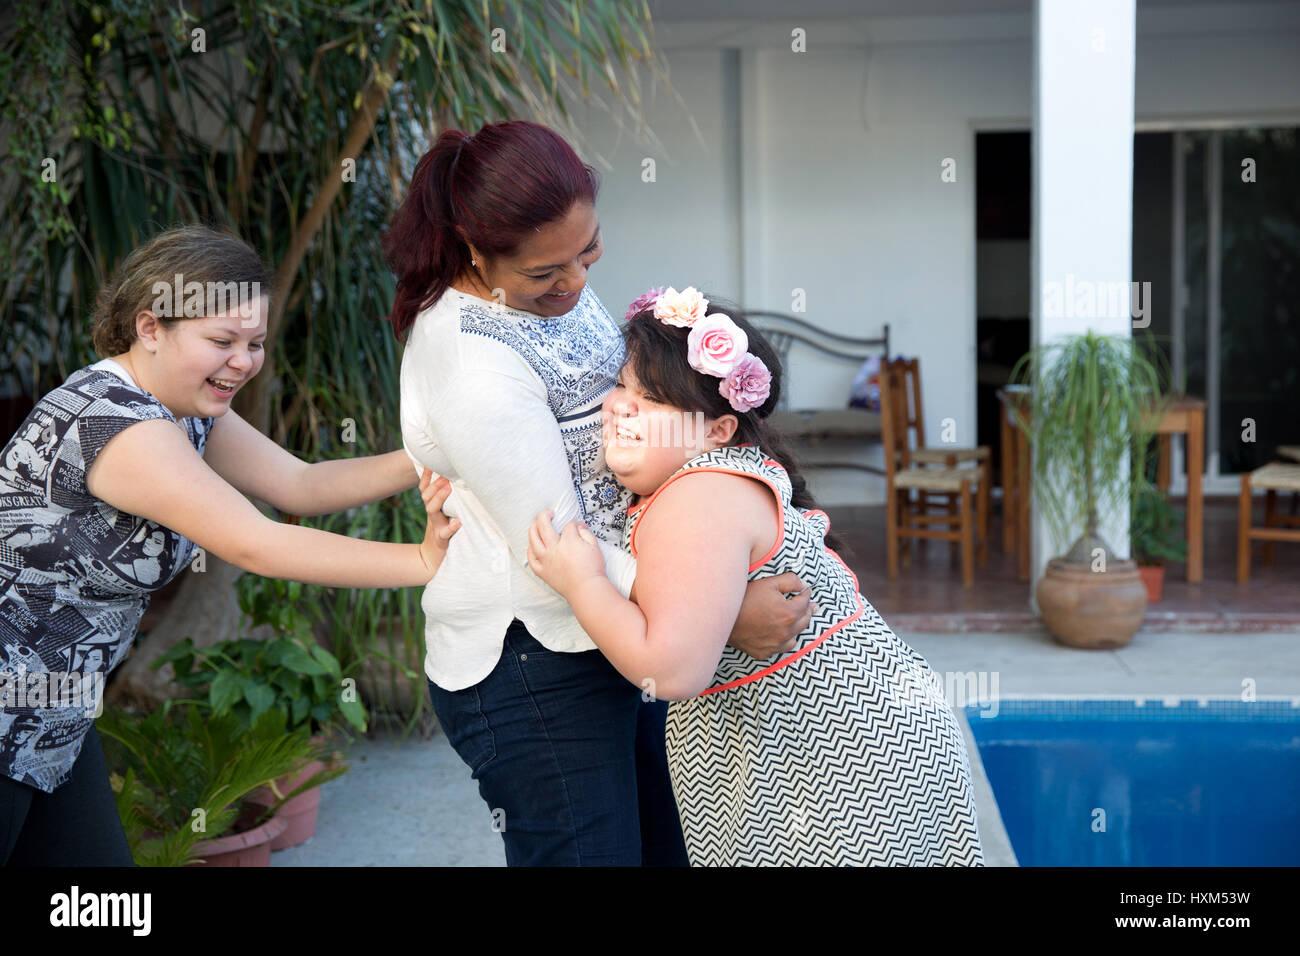 Ana Ximena Navarro (R) playing with her aunt Gabriela Rios Ballesteros (C) and her sister Ana Yamila Navarro (L), - Stock Image